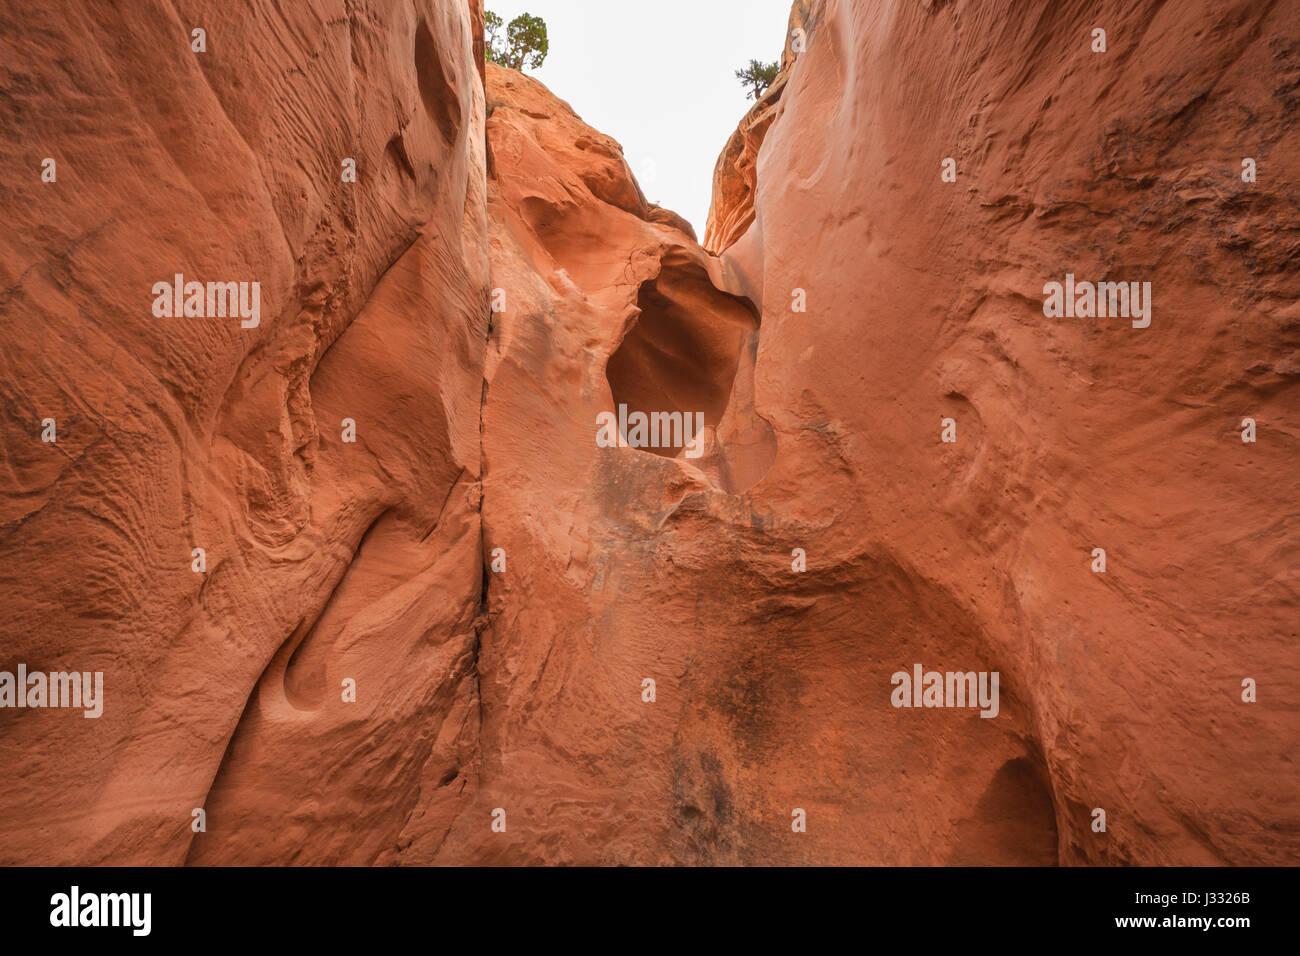 big horn canyon in the harris wash basin near escalante, utah - Stock Image